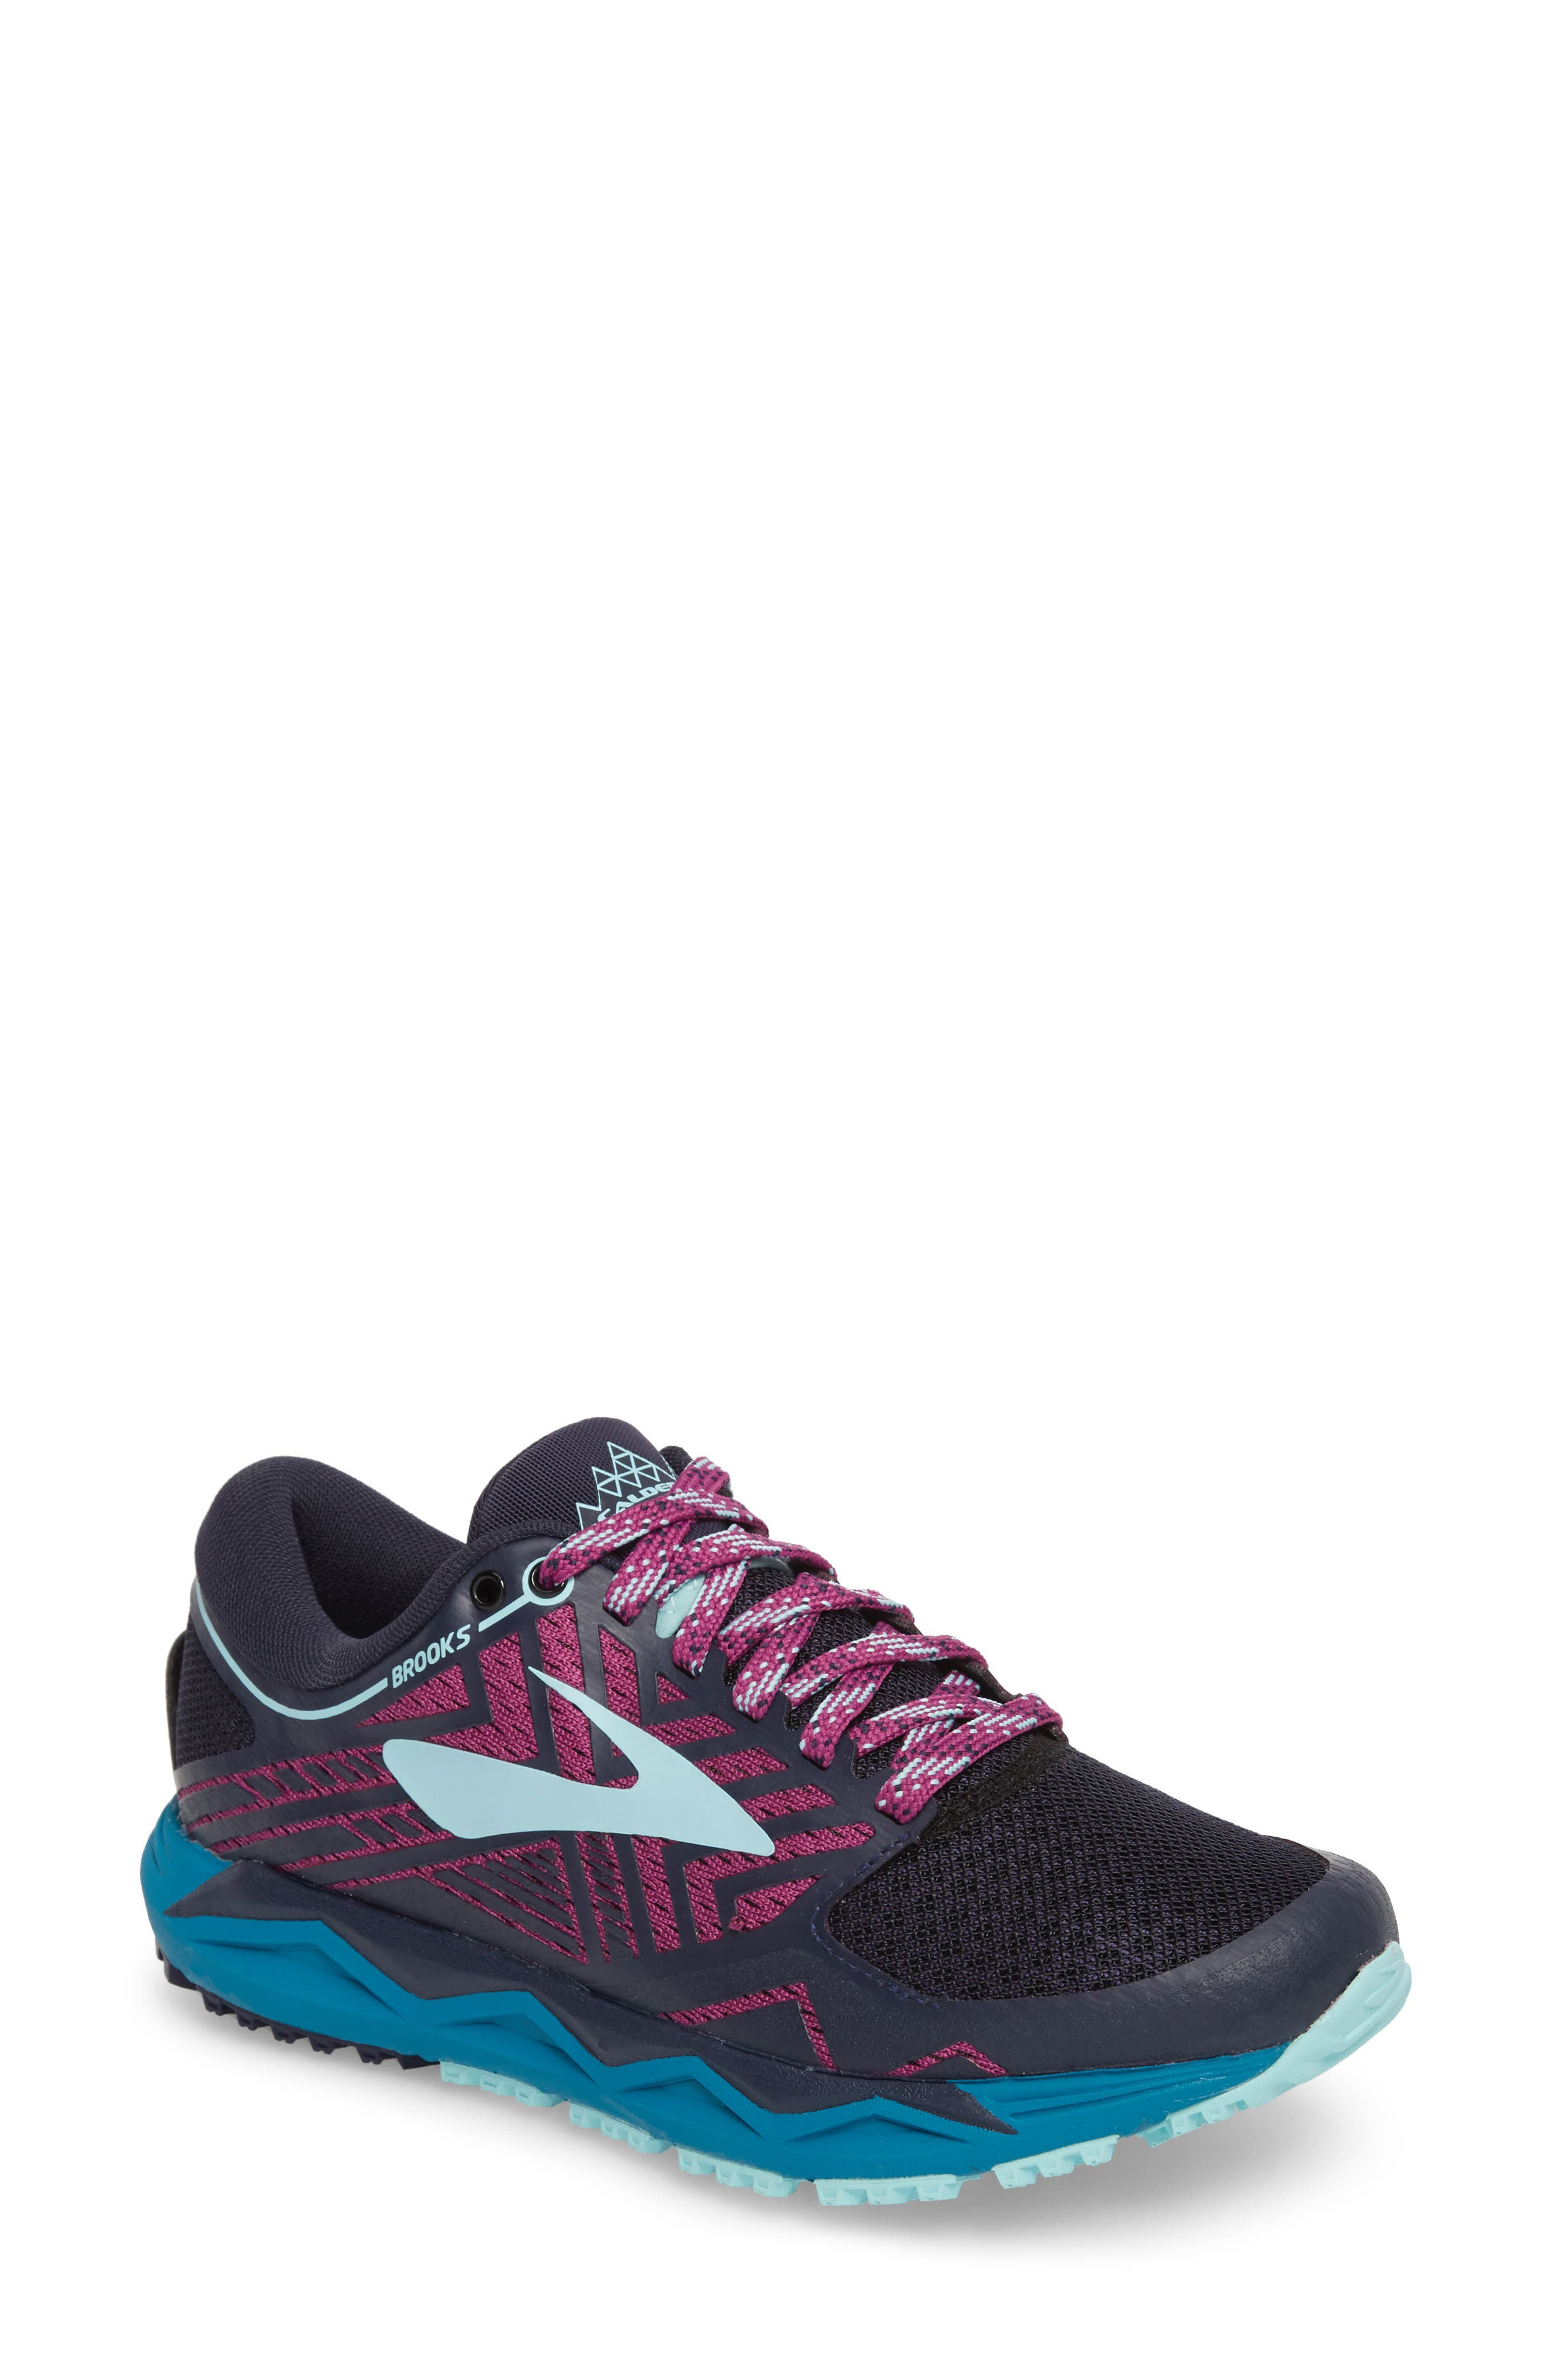 Alternate Image 1 Selected - Brooks Caldera 2 Trail Running Shoe (Women)